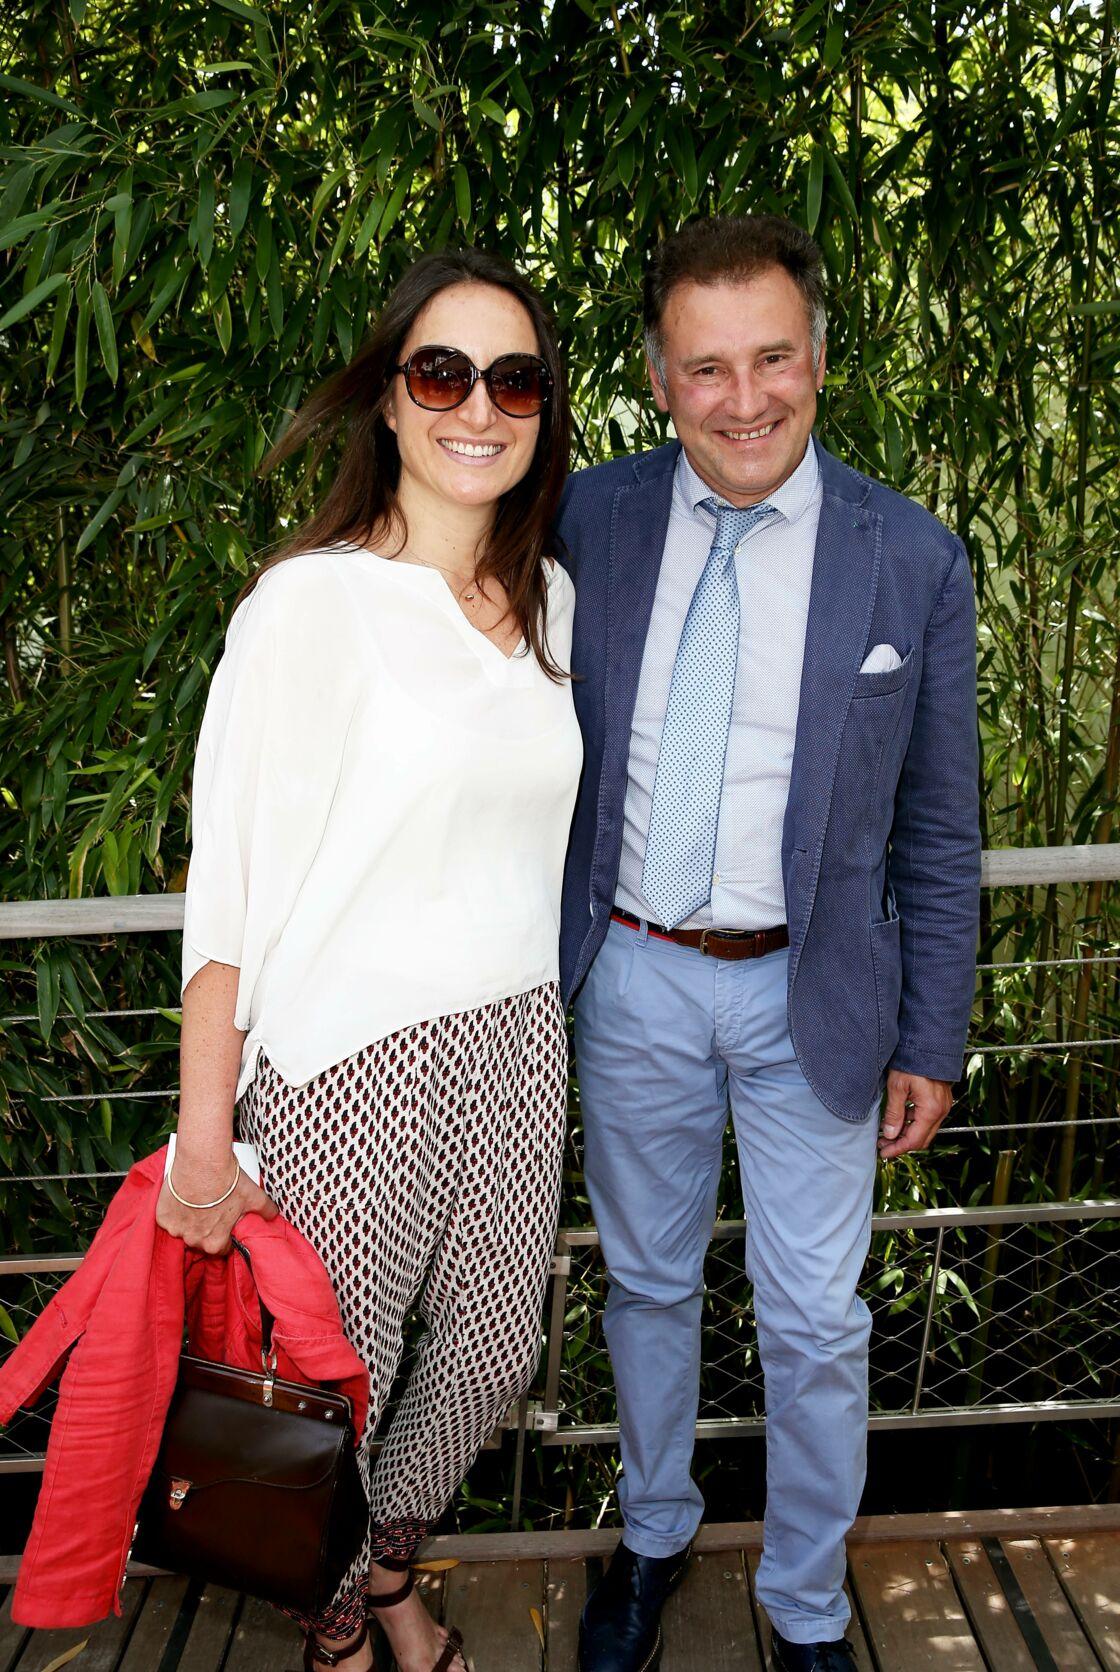 Pierre Sled et Barbara Ricevuto, en 2017, à Roland-Garros.